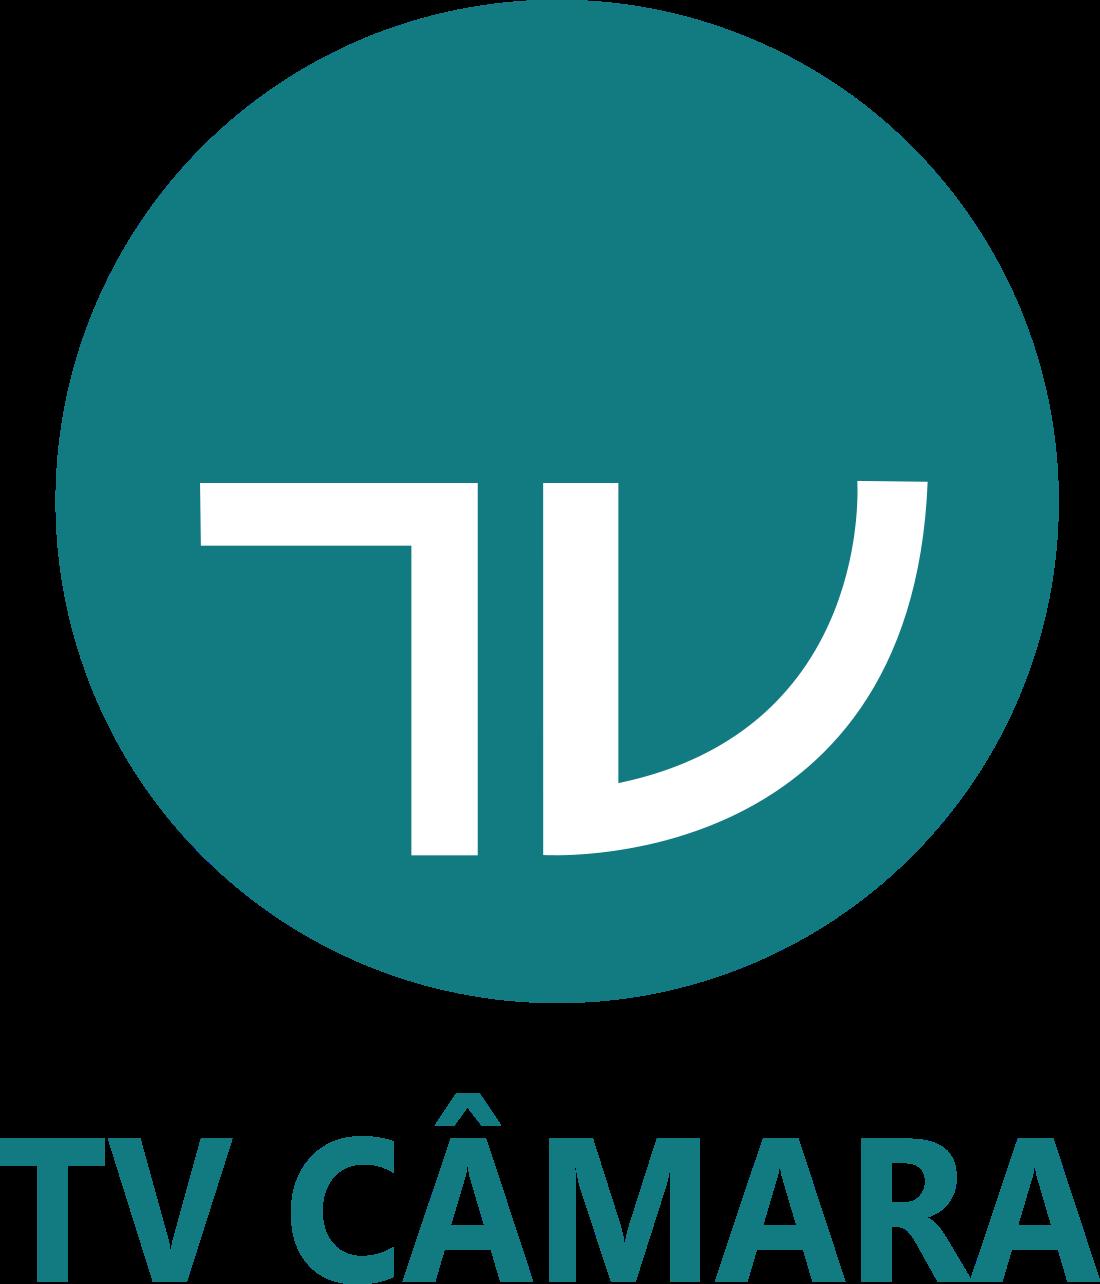 tv-camara-logo-3